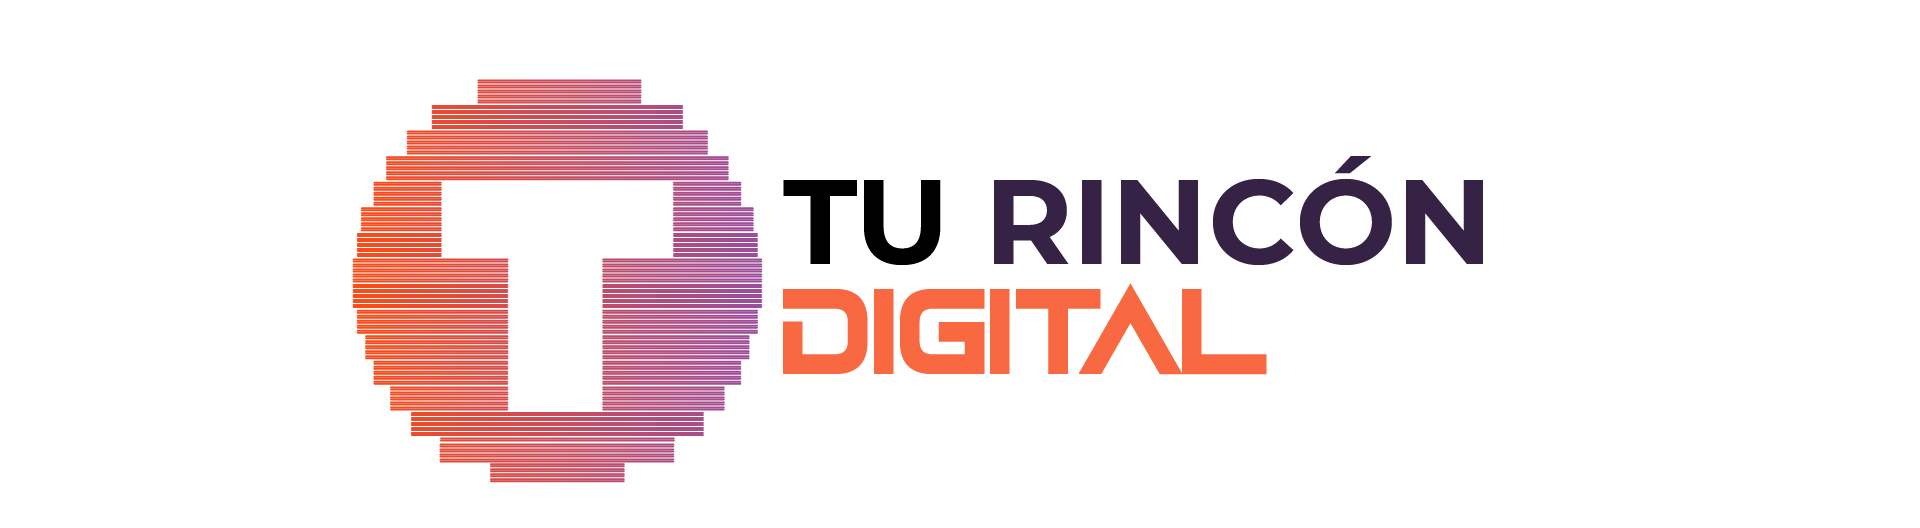 Tu Rincón Digital | 🚀Agencia Digital | Diseño Web Creativo | SEO Google & Youtube